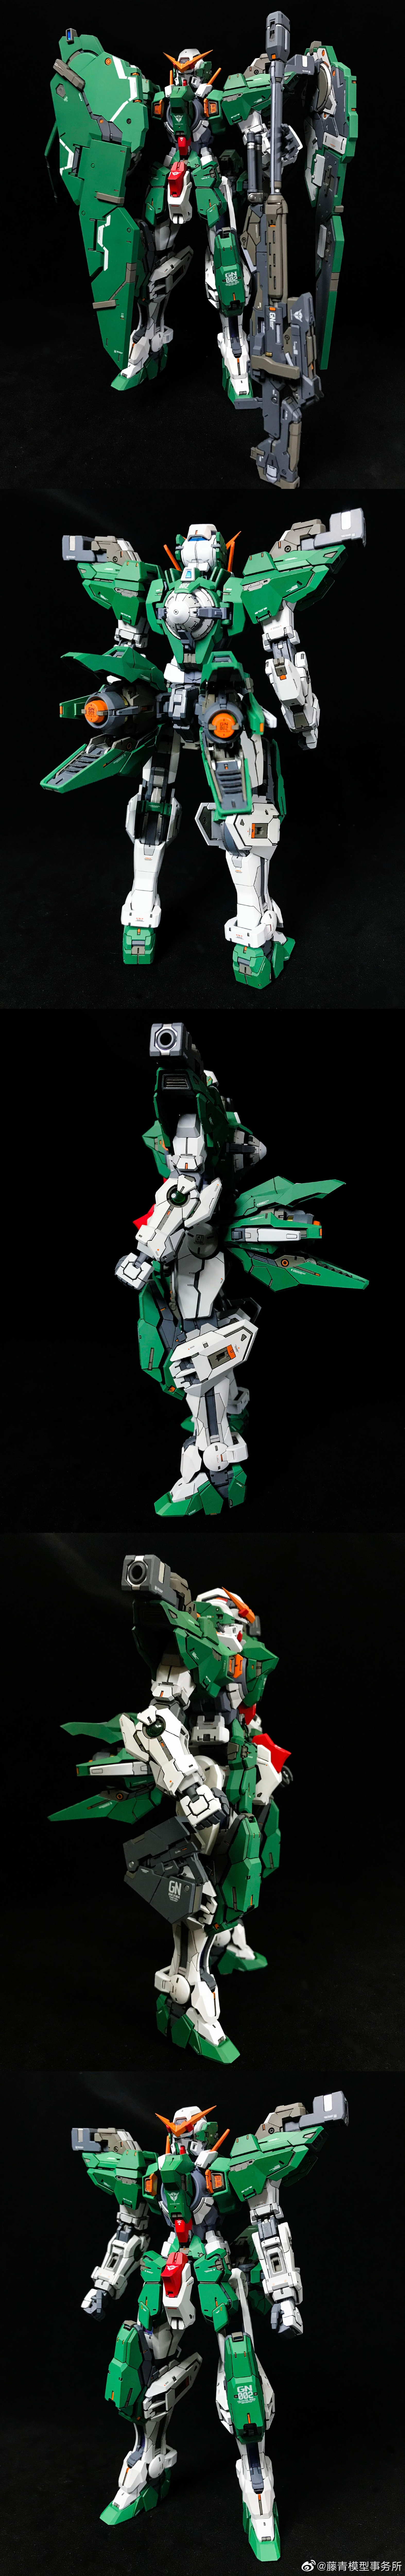 G507_Fortune_Meows_Studio_GN002_Gundam_Dynames_MG_001.jpg